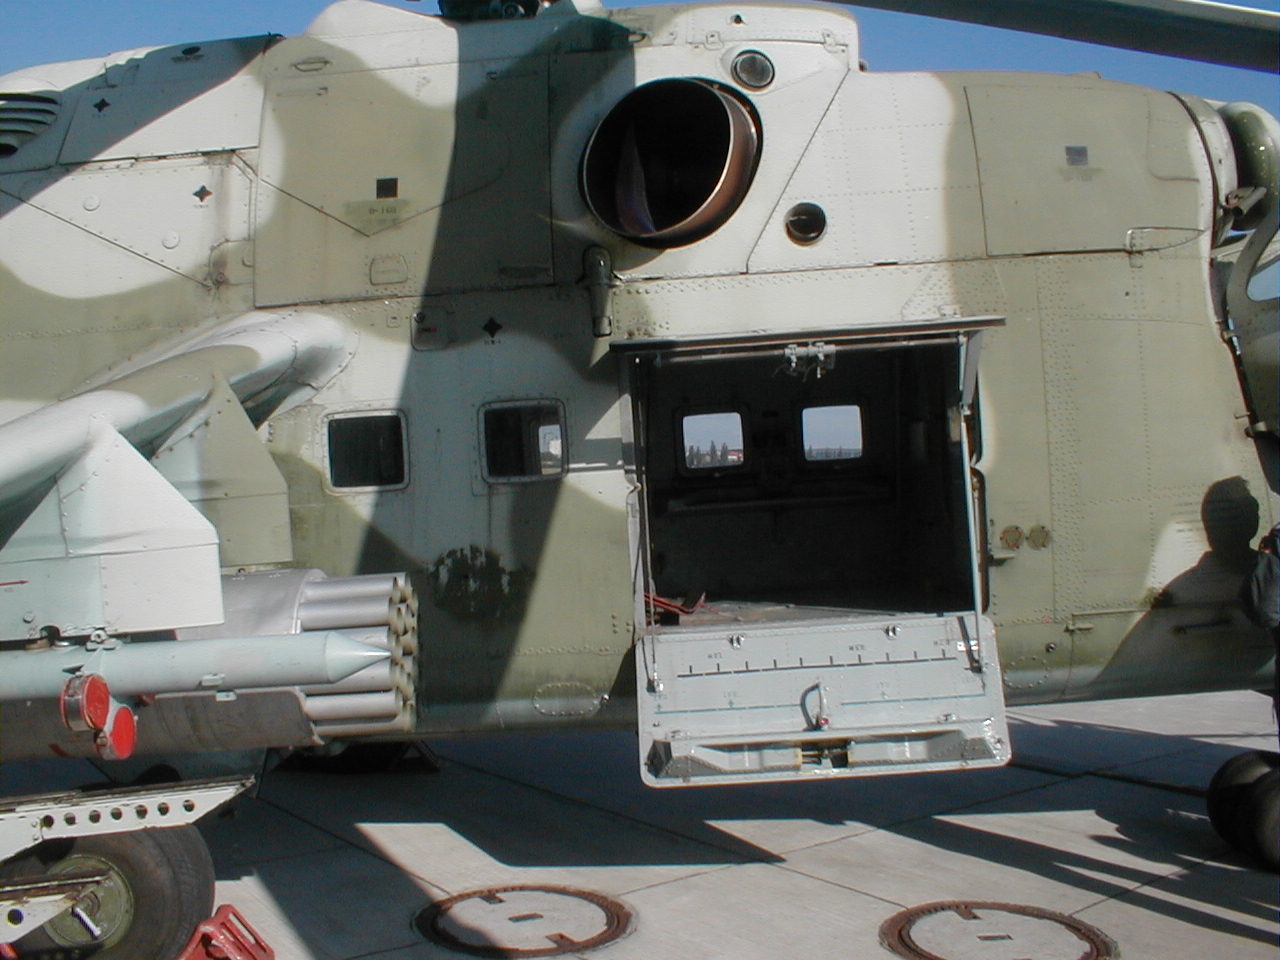 FileMi-24 door opened at Cottbus airfield.jpg & File:Mi-24 door opened at Cottbus airfield.jpg - Wikimedia Commons